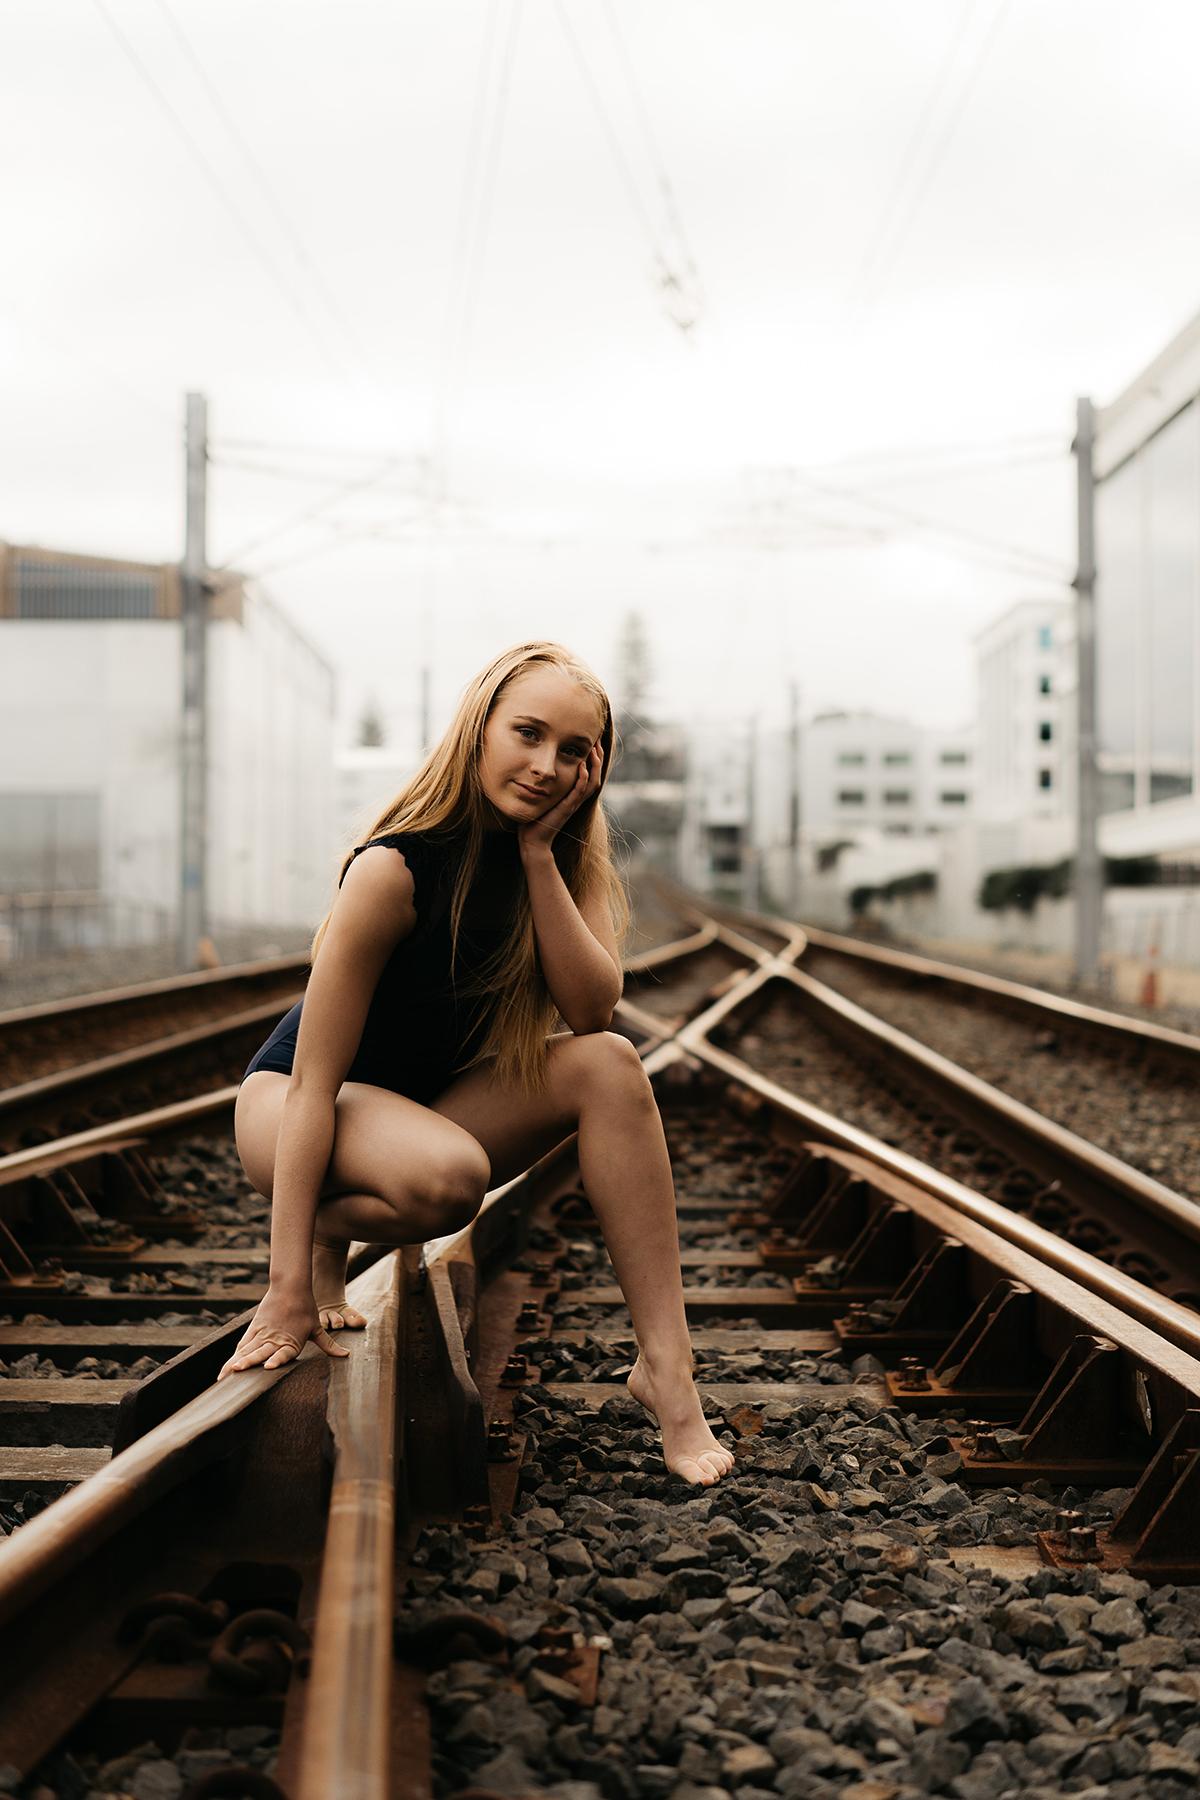 Keelia_Kennychickphotos-59.jpg